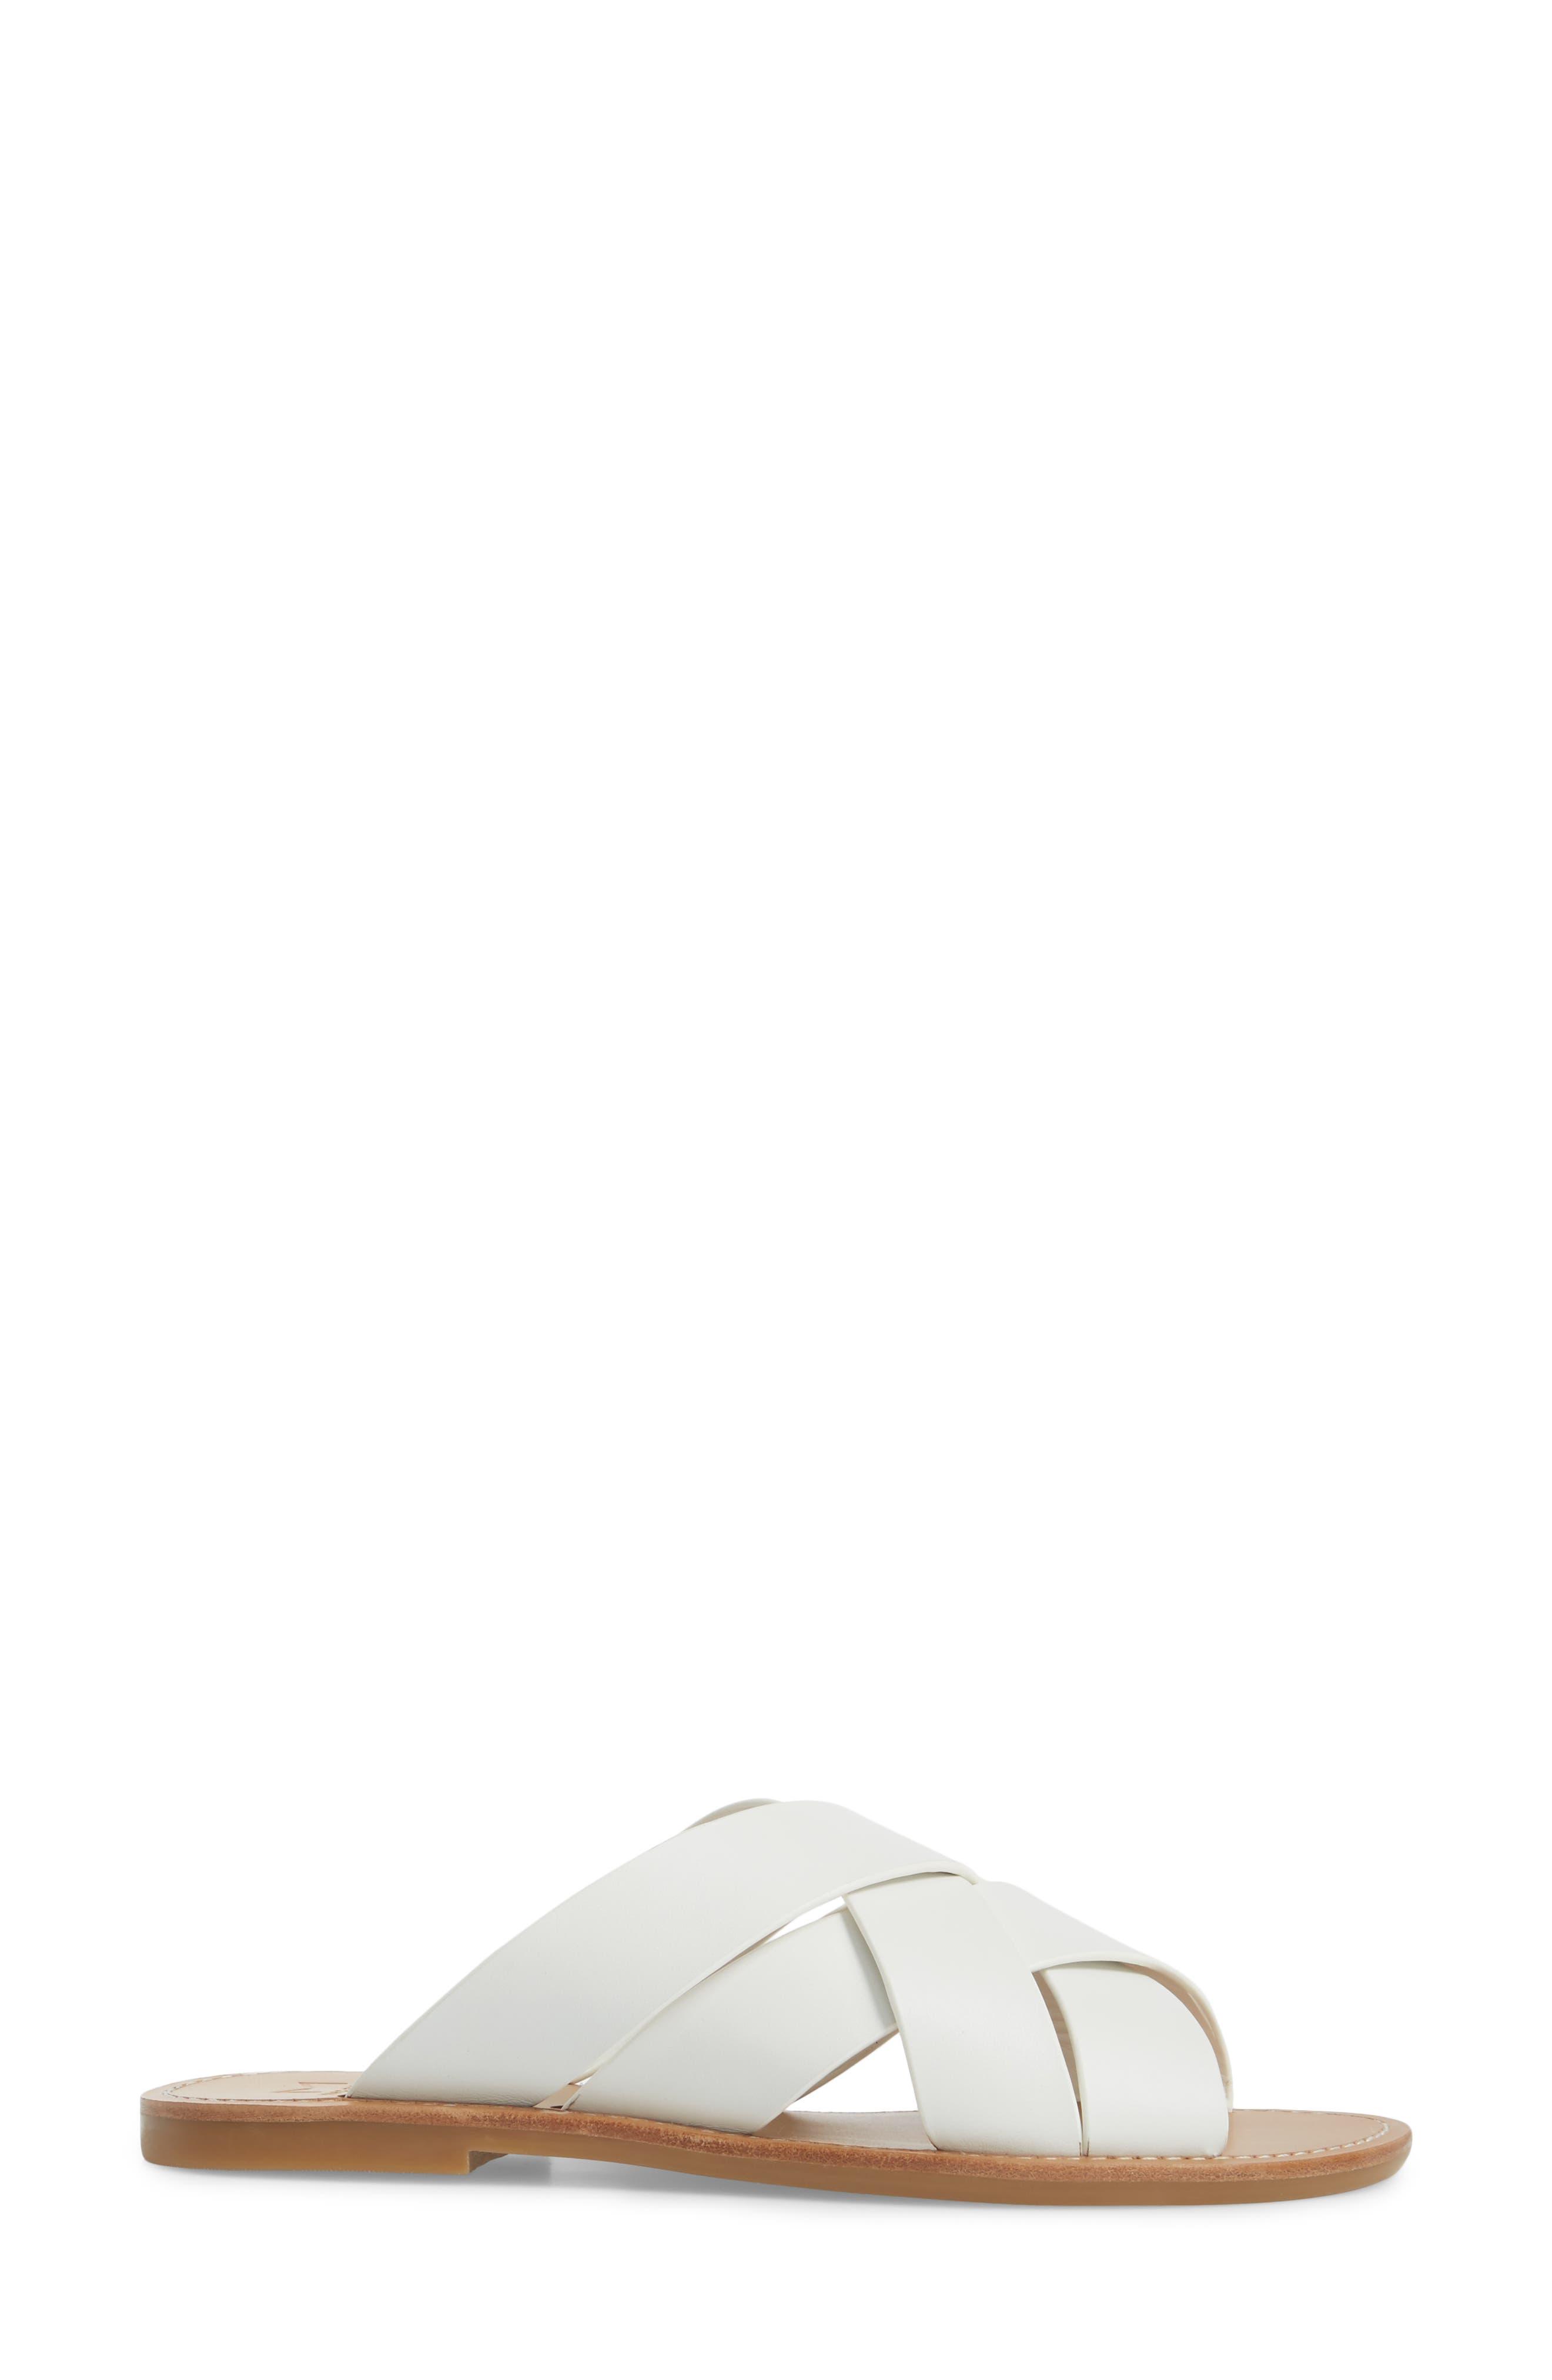 Raida Slide Sandal,                             Alternate thumbnail 3, color,                             White Leather